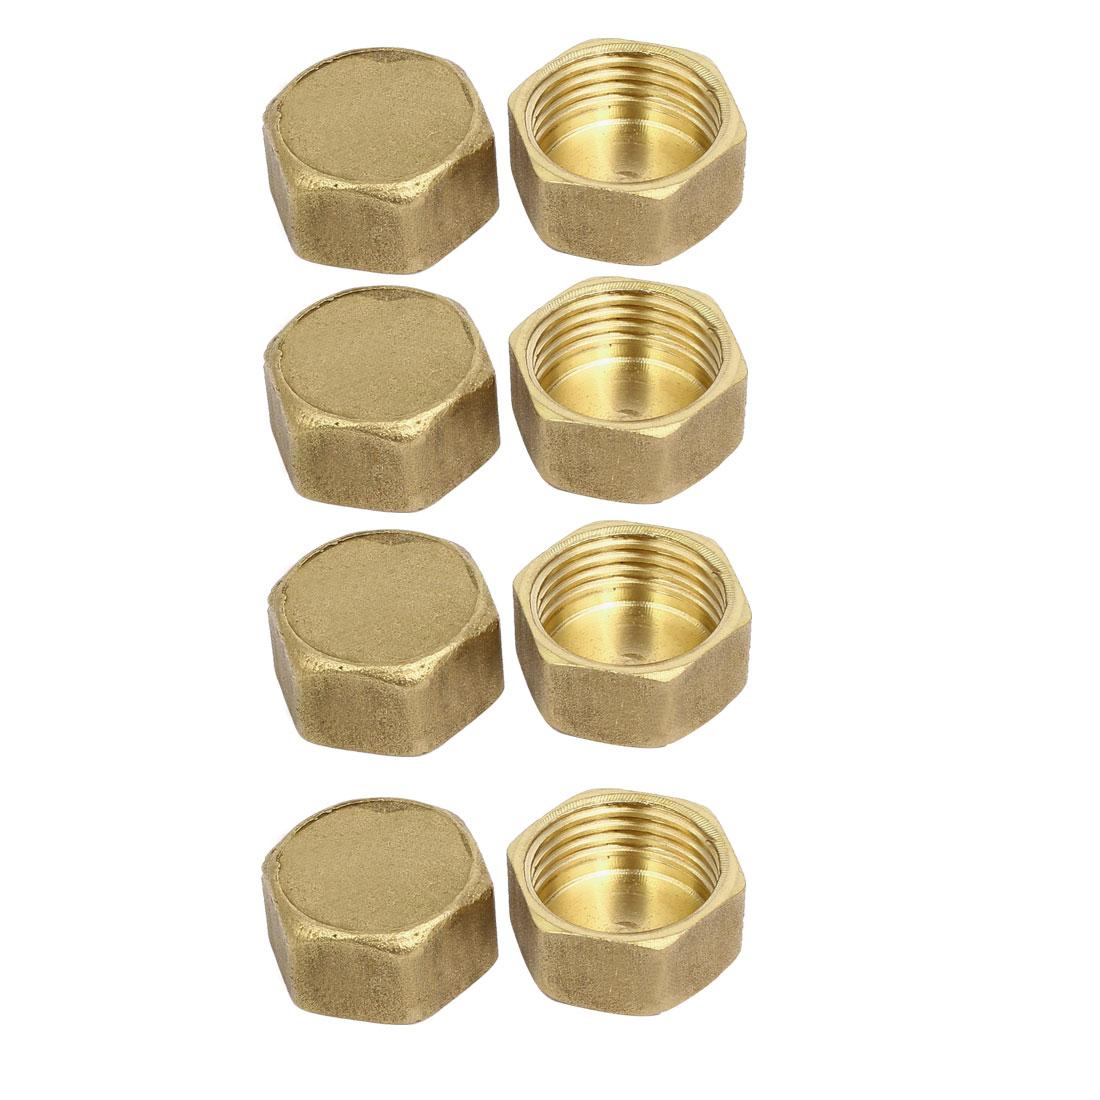 1/2BSP Female Thread Brass Hex Head Pipe Caps Cover Fitting 8pcs